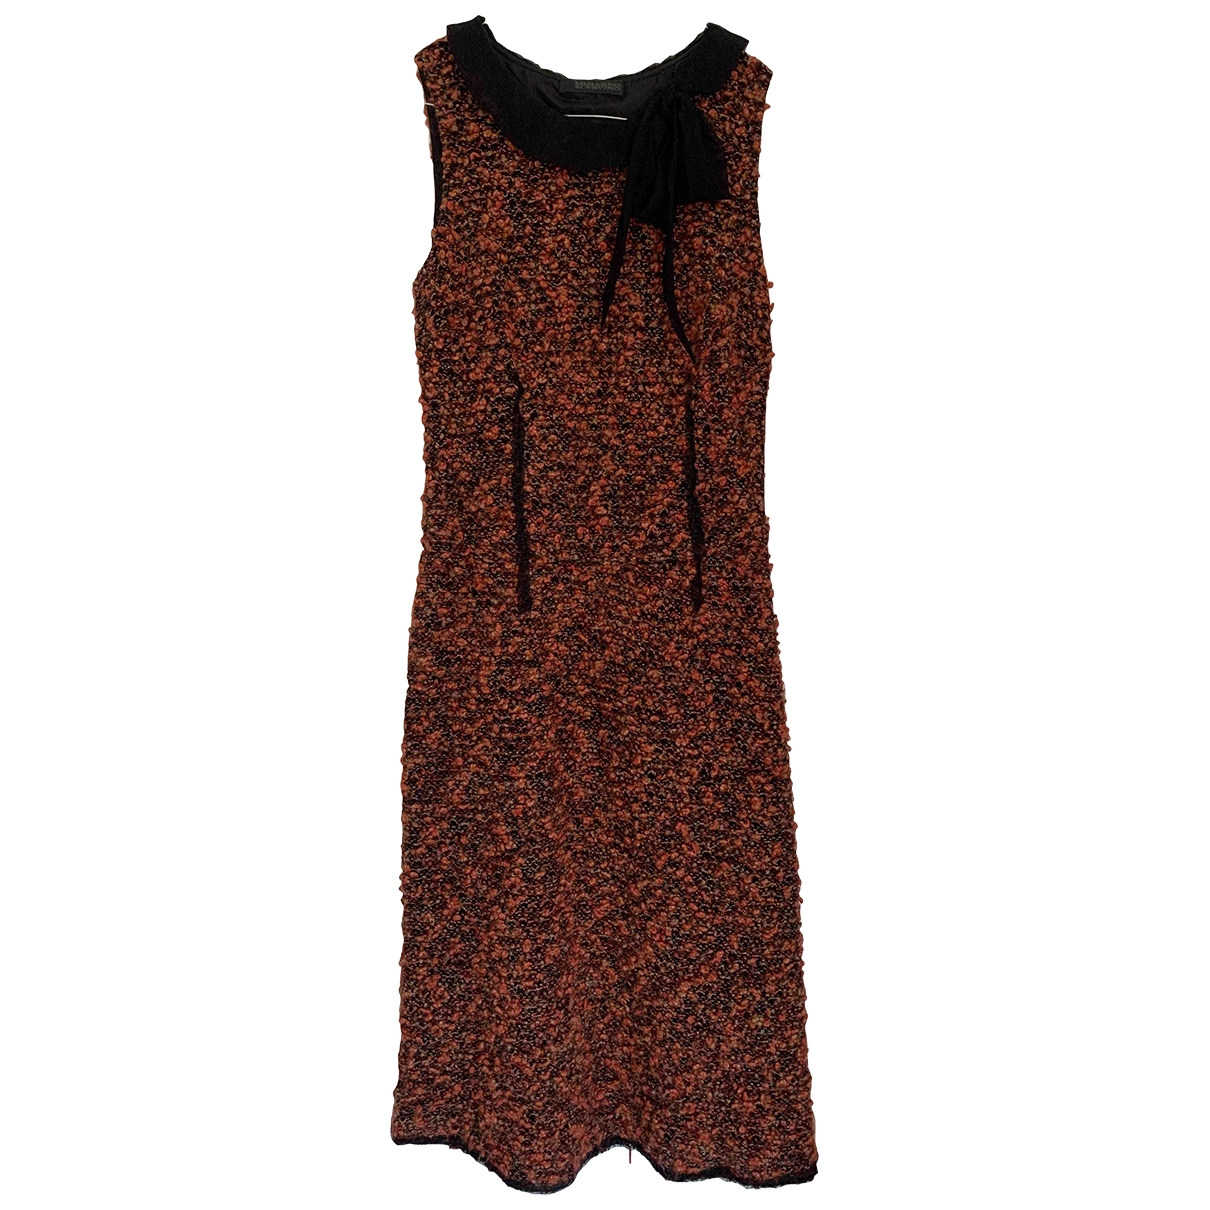 Ermanno Scervino \N Wool dress for Women 40 IT